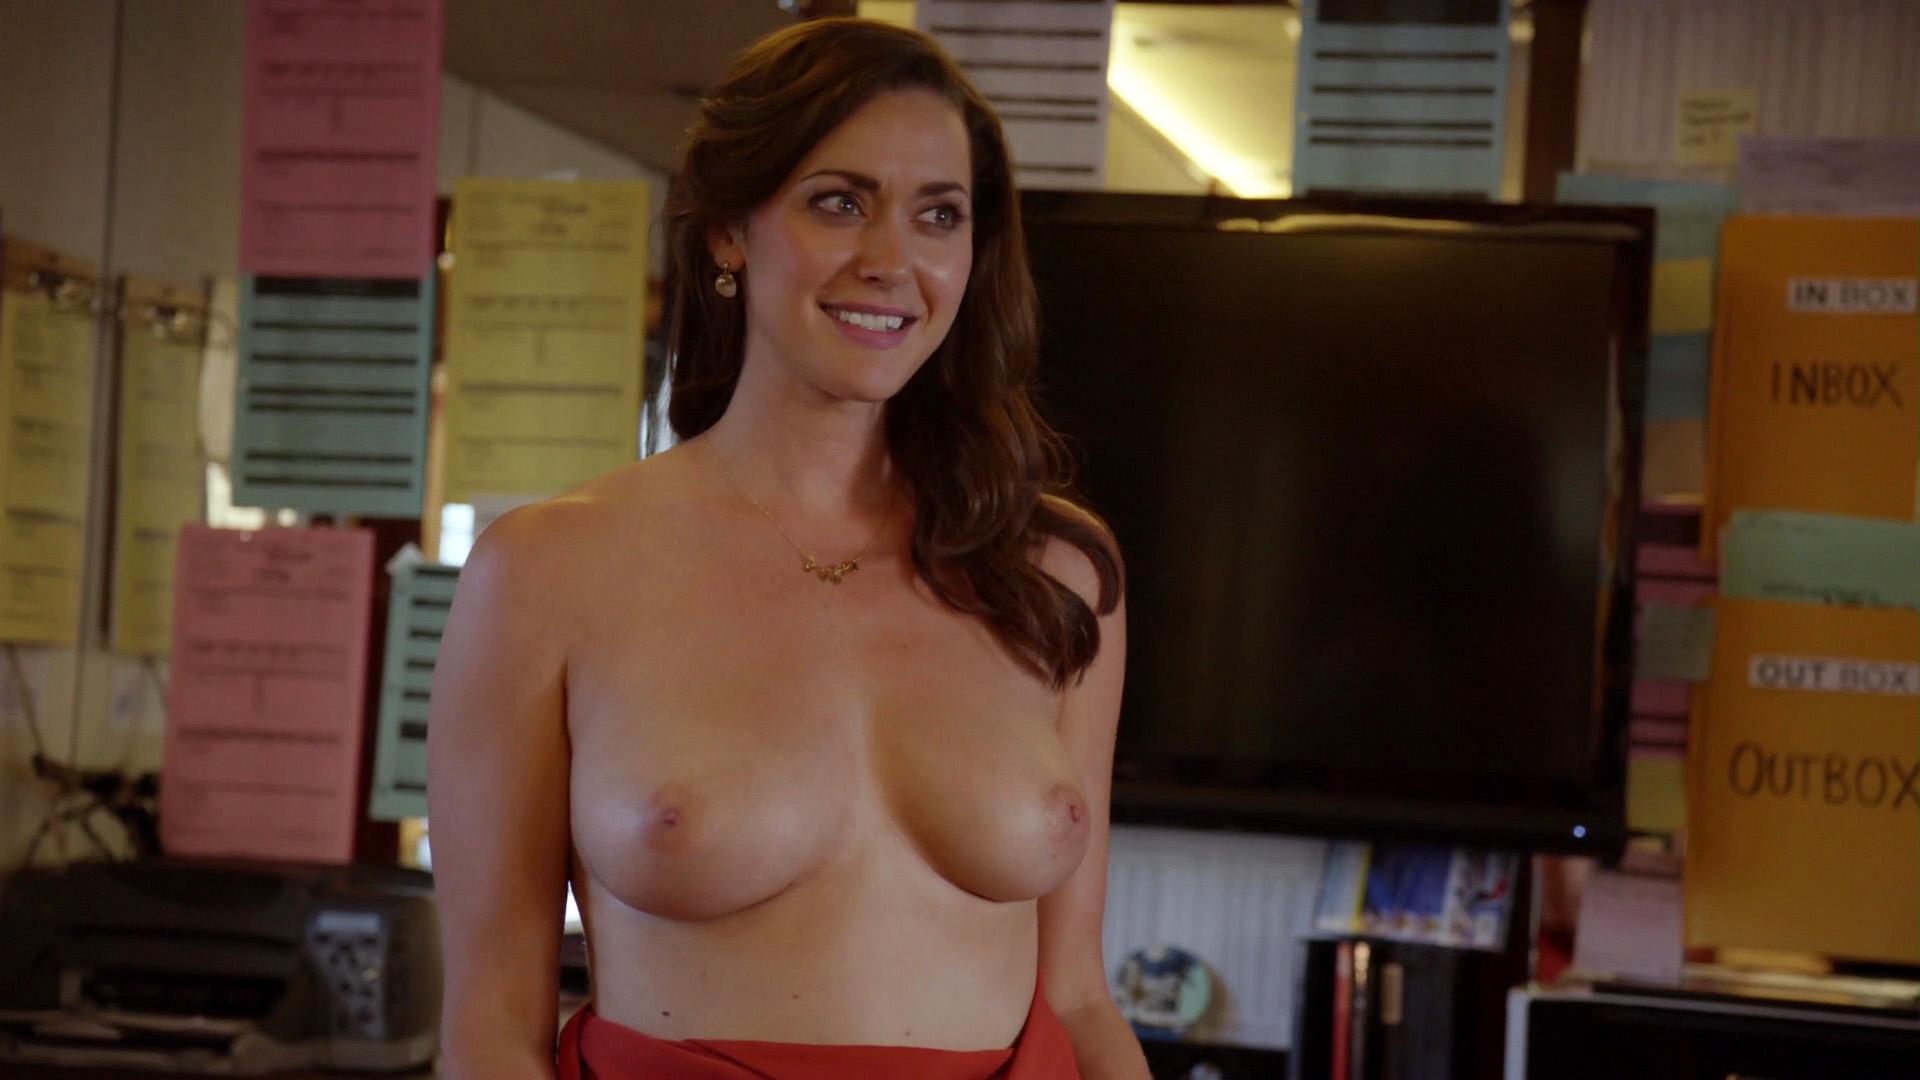 Hard dominant porn gif